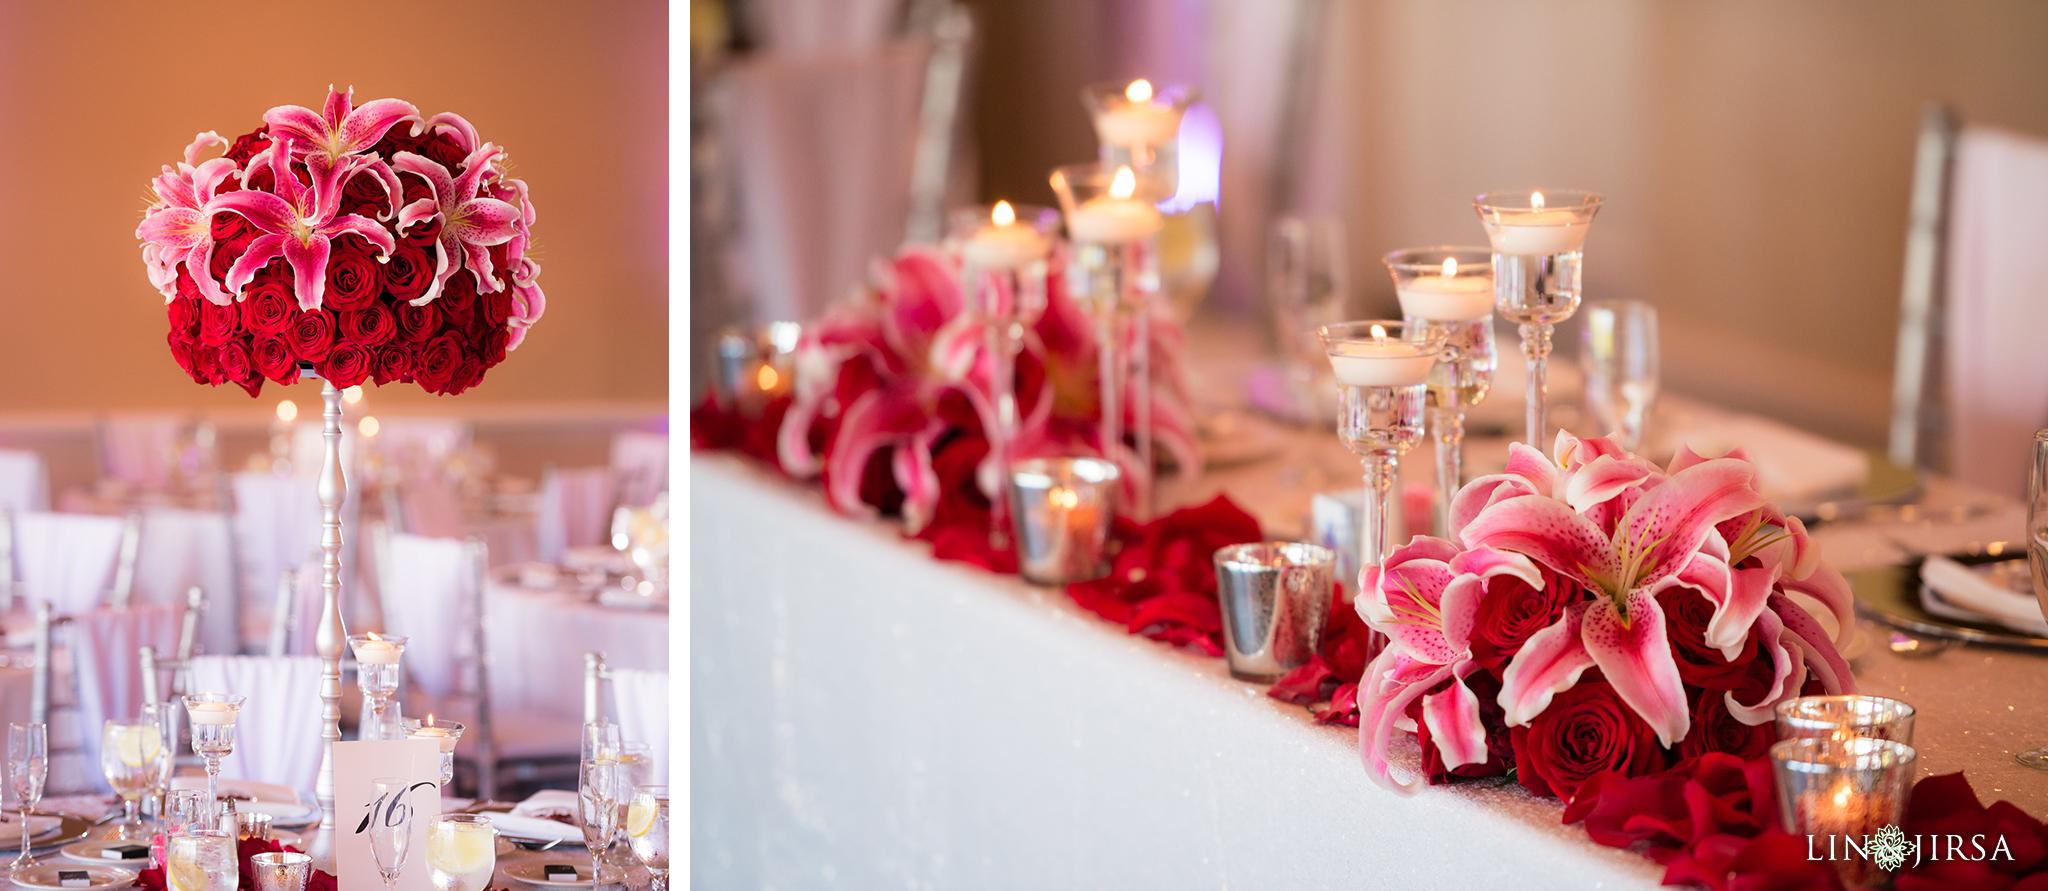 19-grand-tradition-estate-fallbrook-wedding-photography